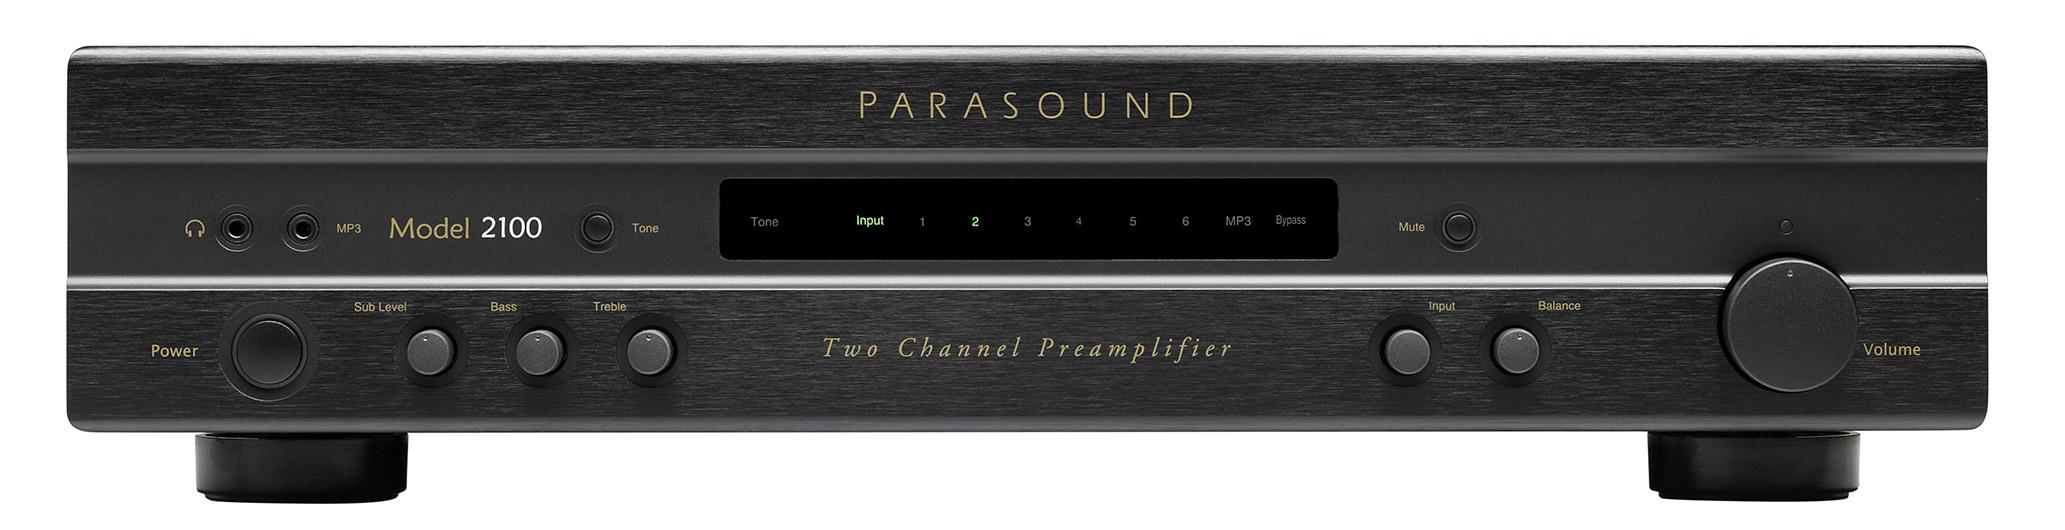 good 2 channel stereo preamplifier